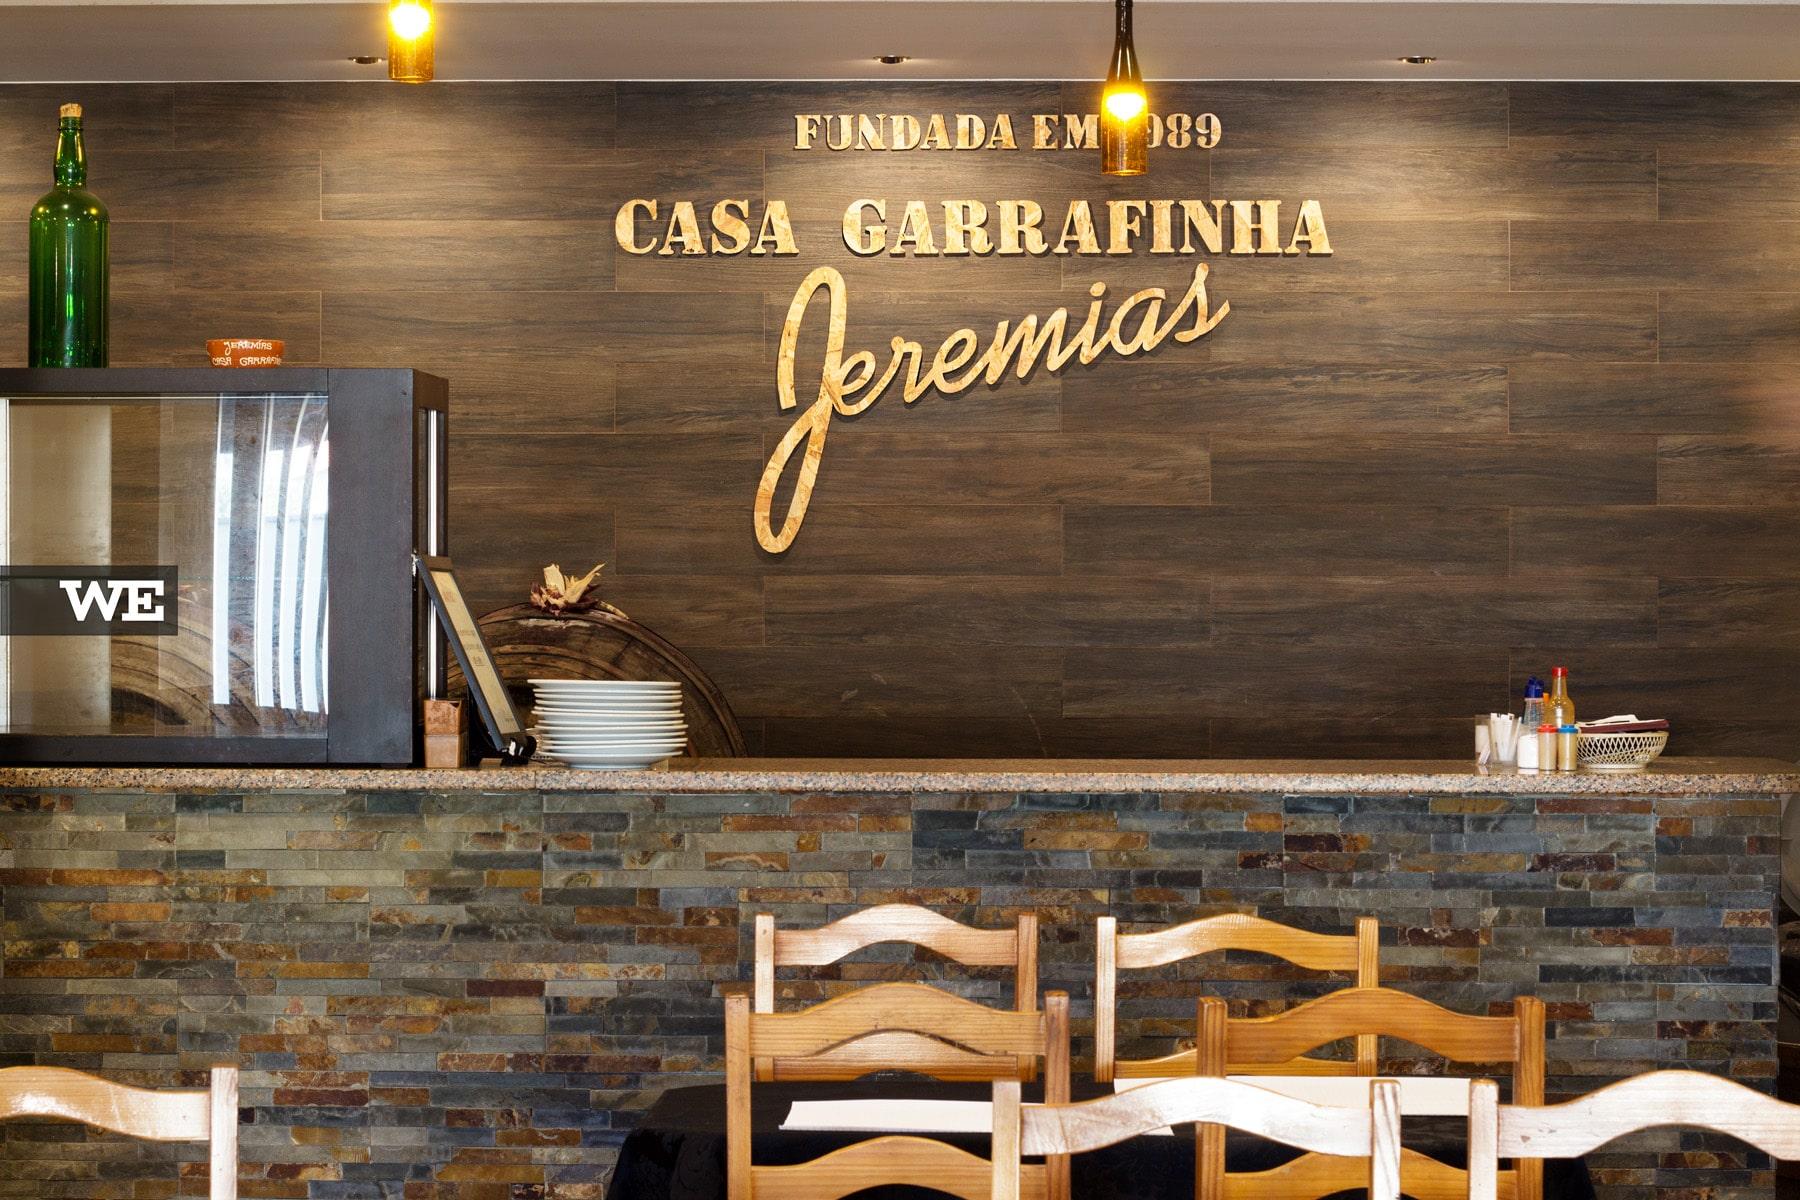 Casa Garrafinha Jeremias